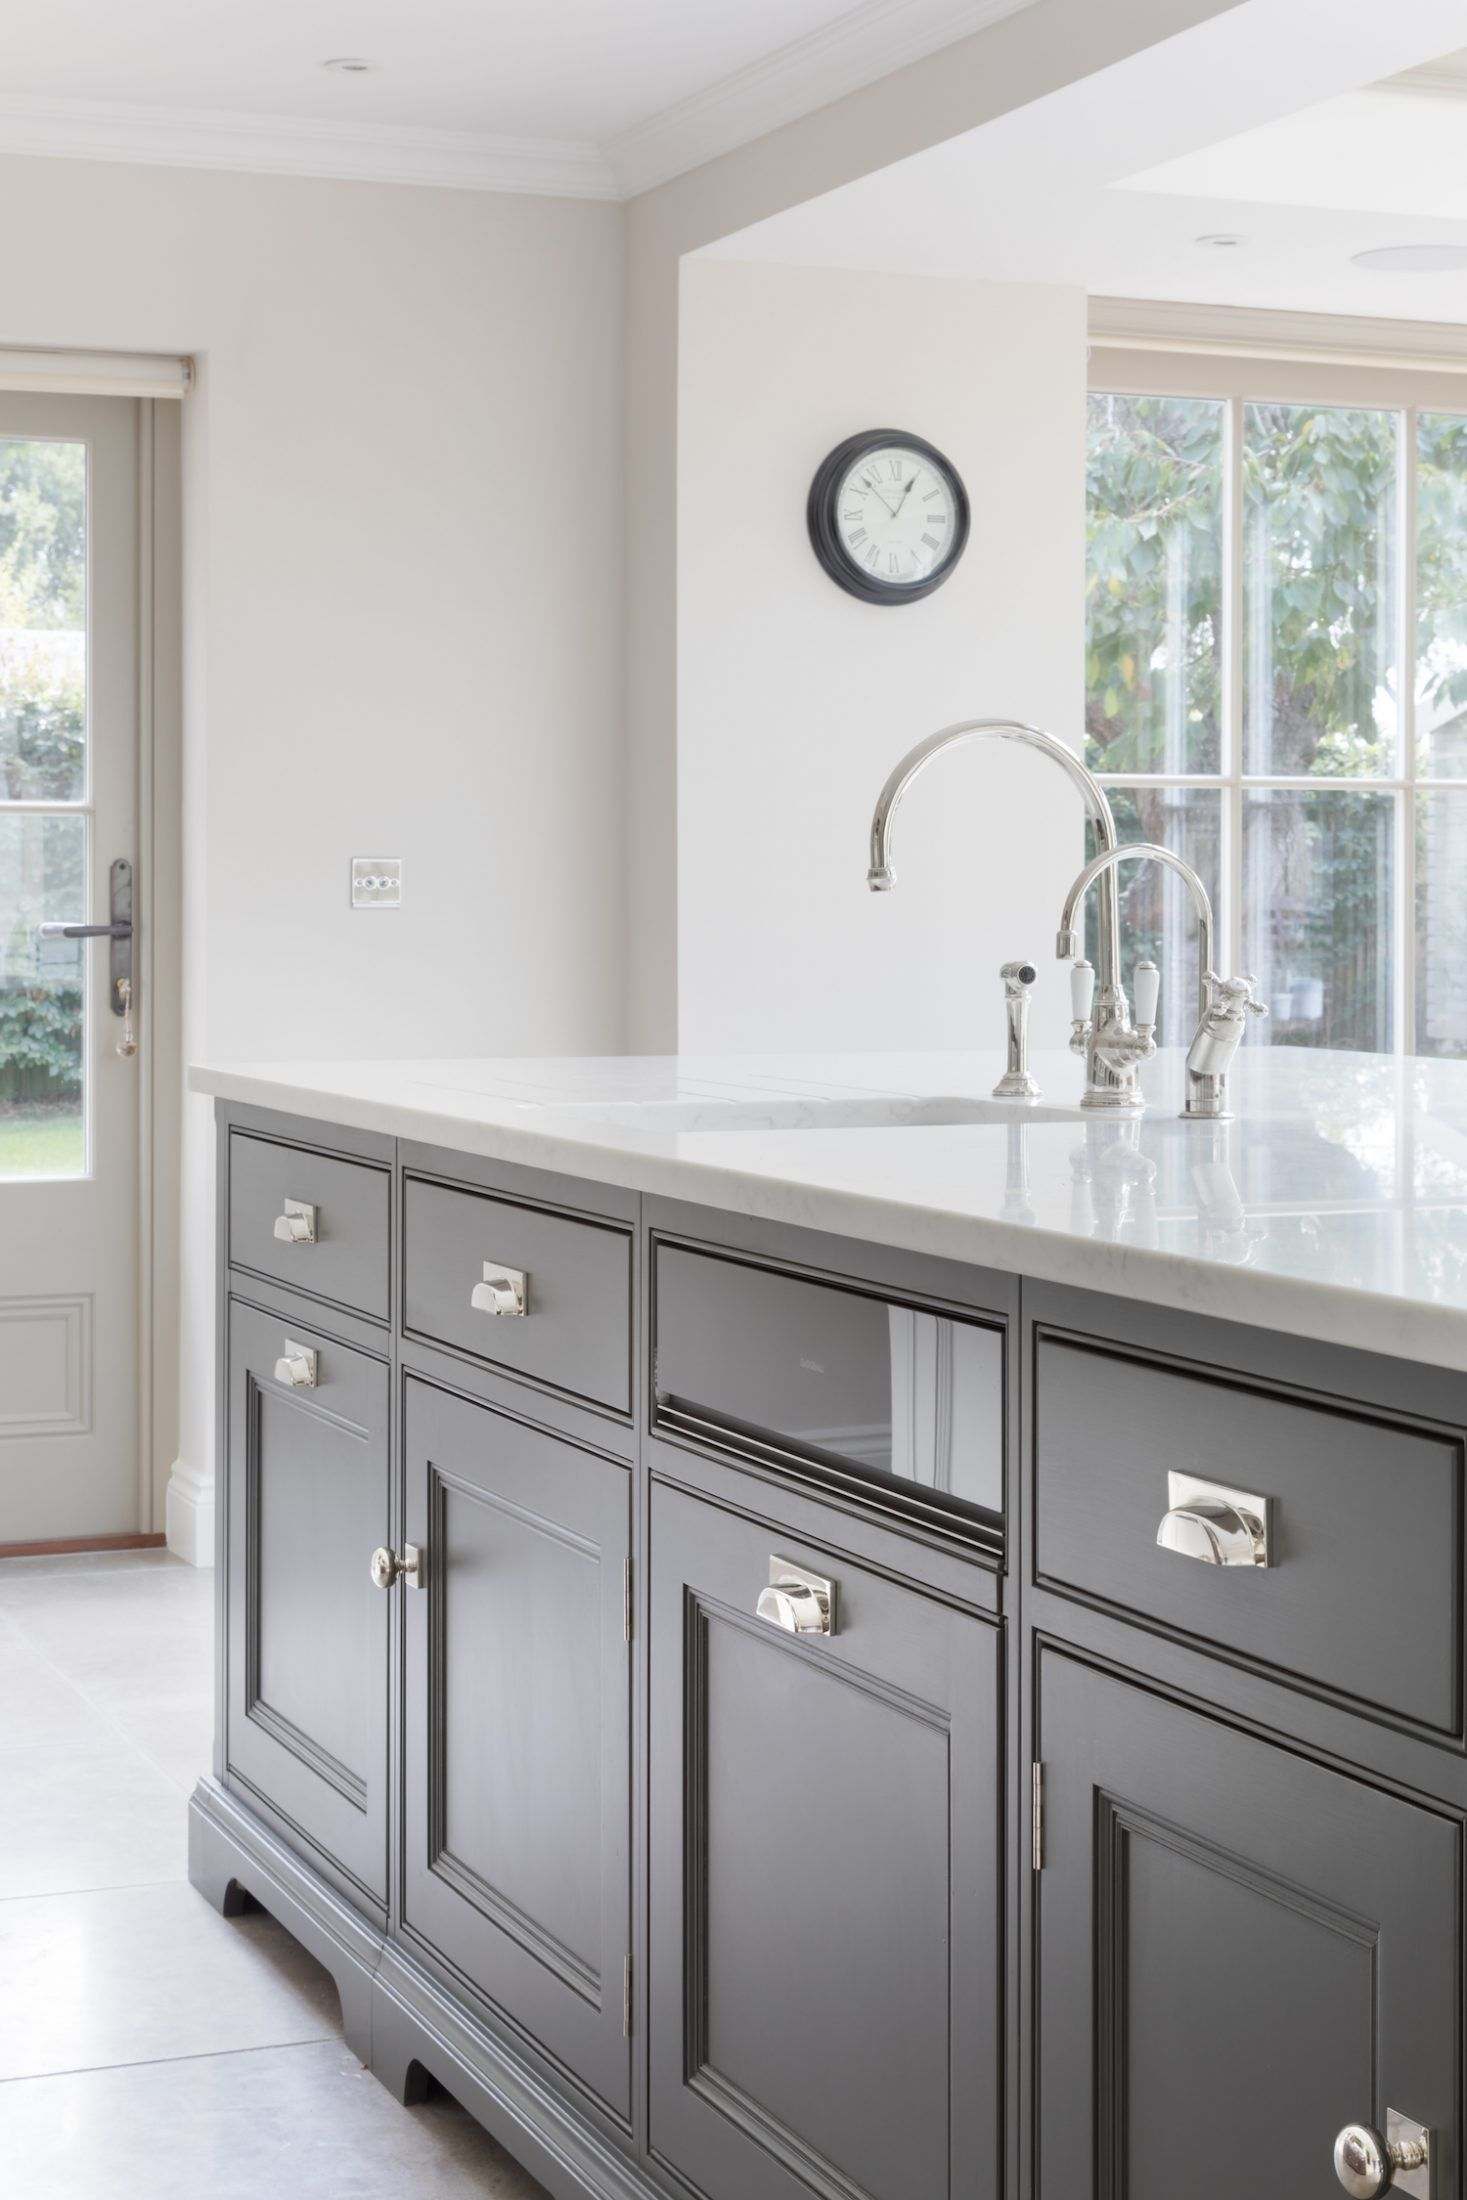 Classic Contemporary Kitchen Project Sevenoaks Kent Humphrey Munson Kitchens Kitchenfaucetken American Kitchen Design Kitchen Design Luxury Kitchen Design